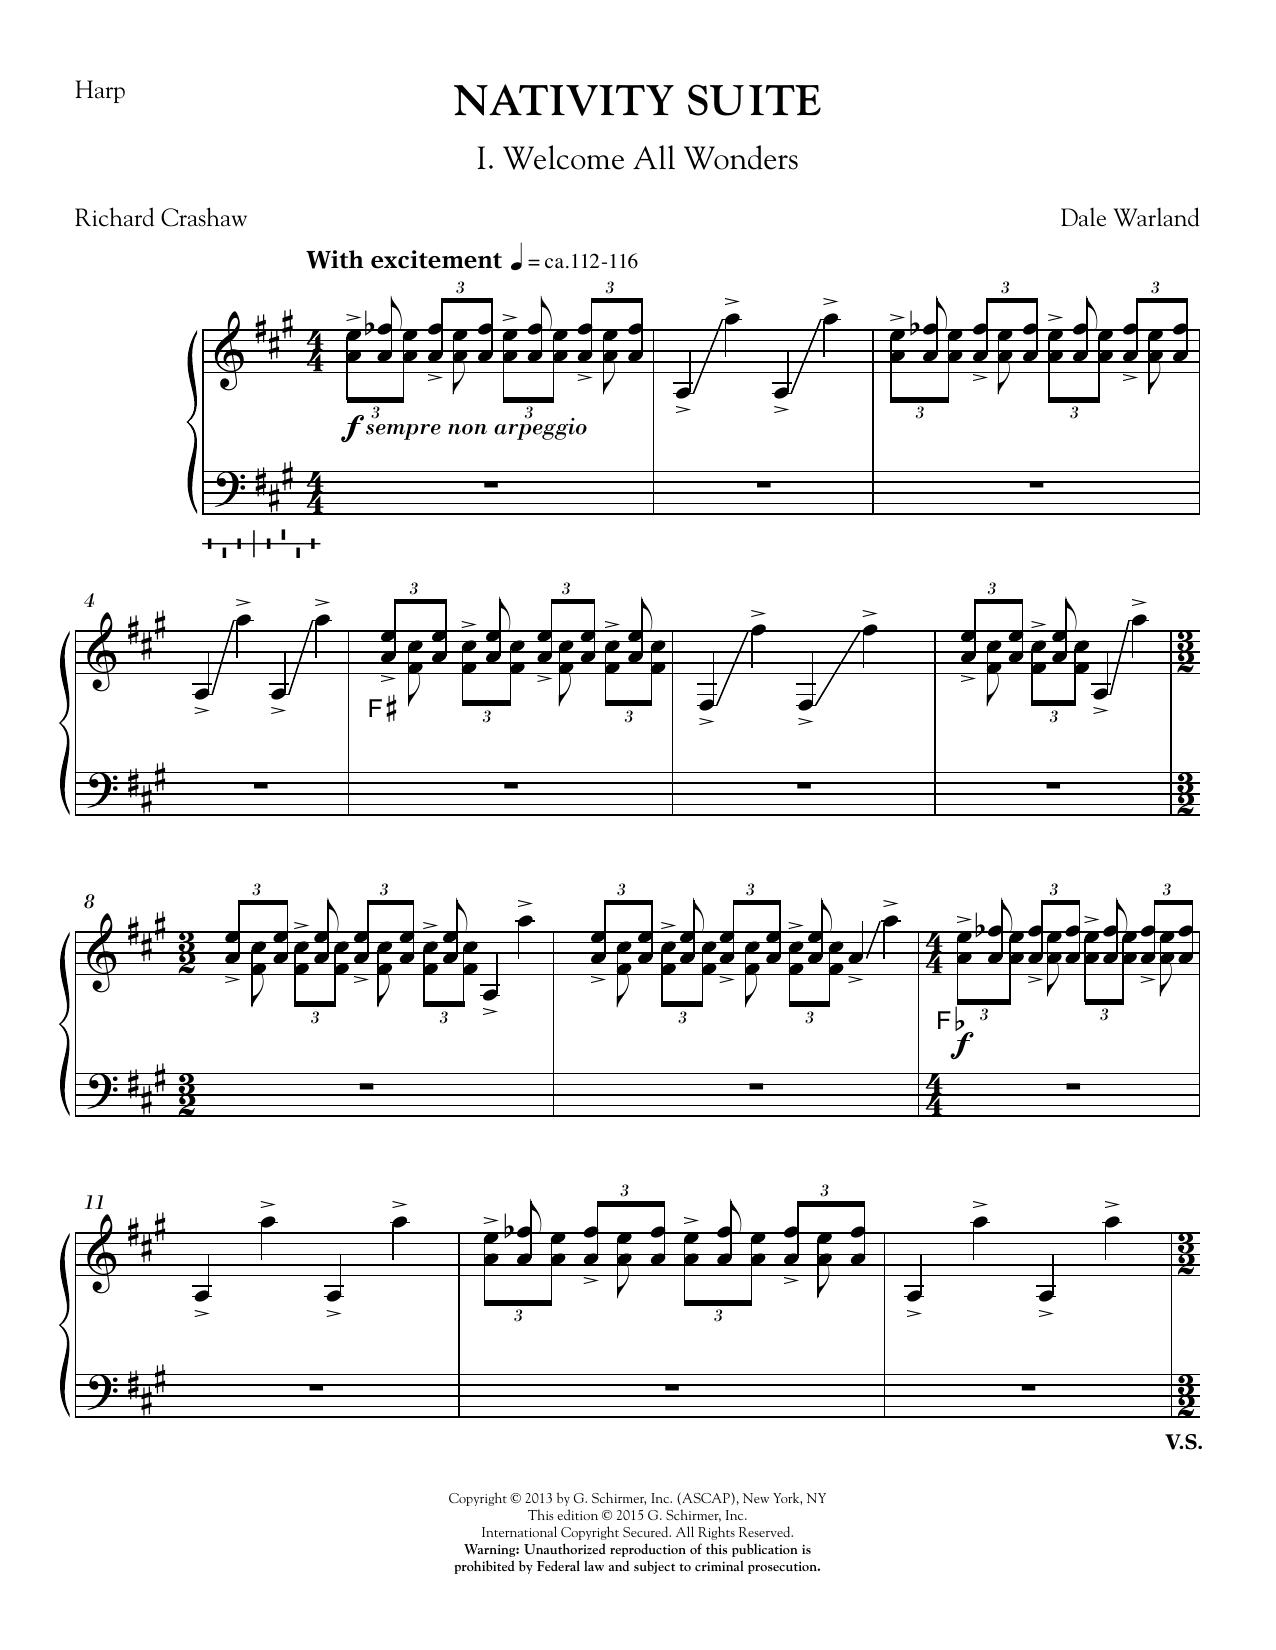 Nativity Suite - Harp sheet music